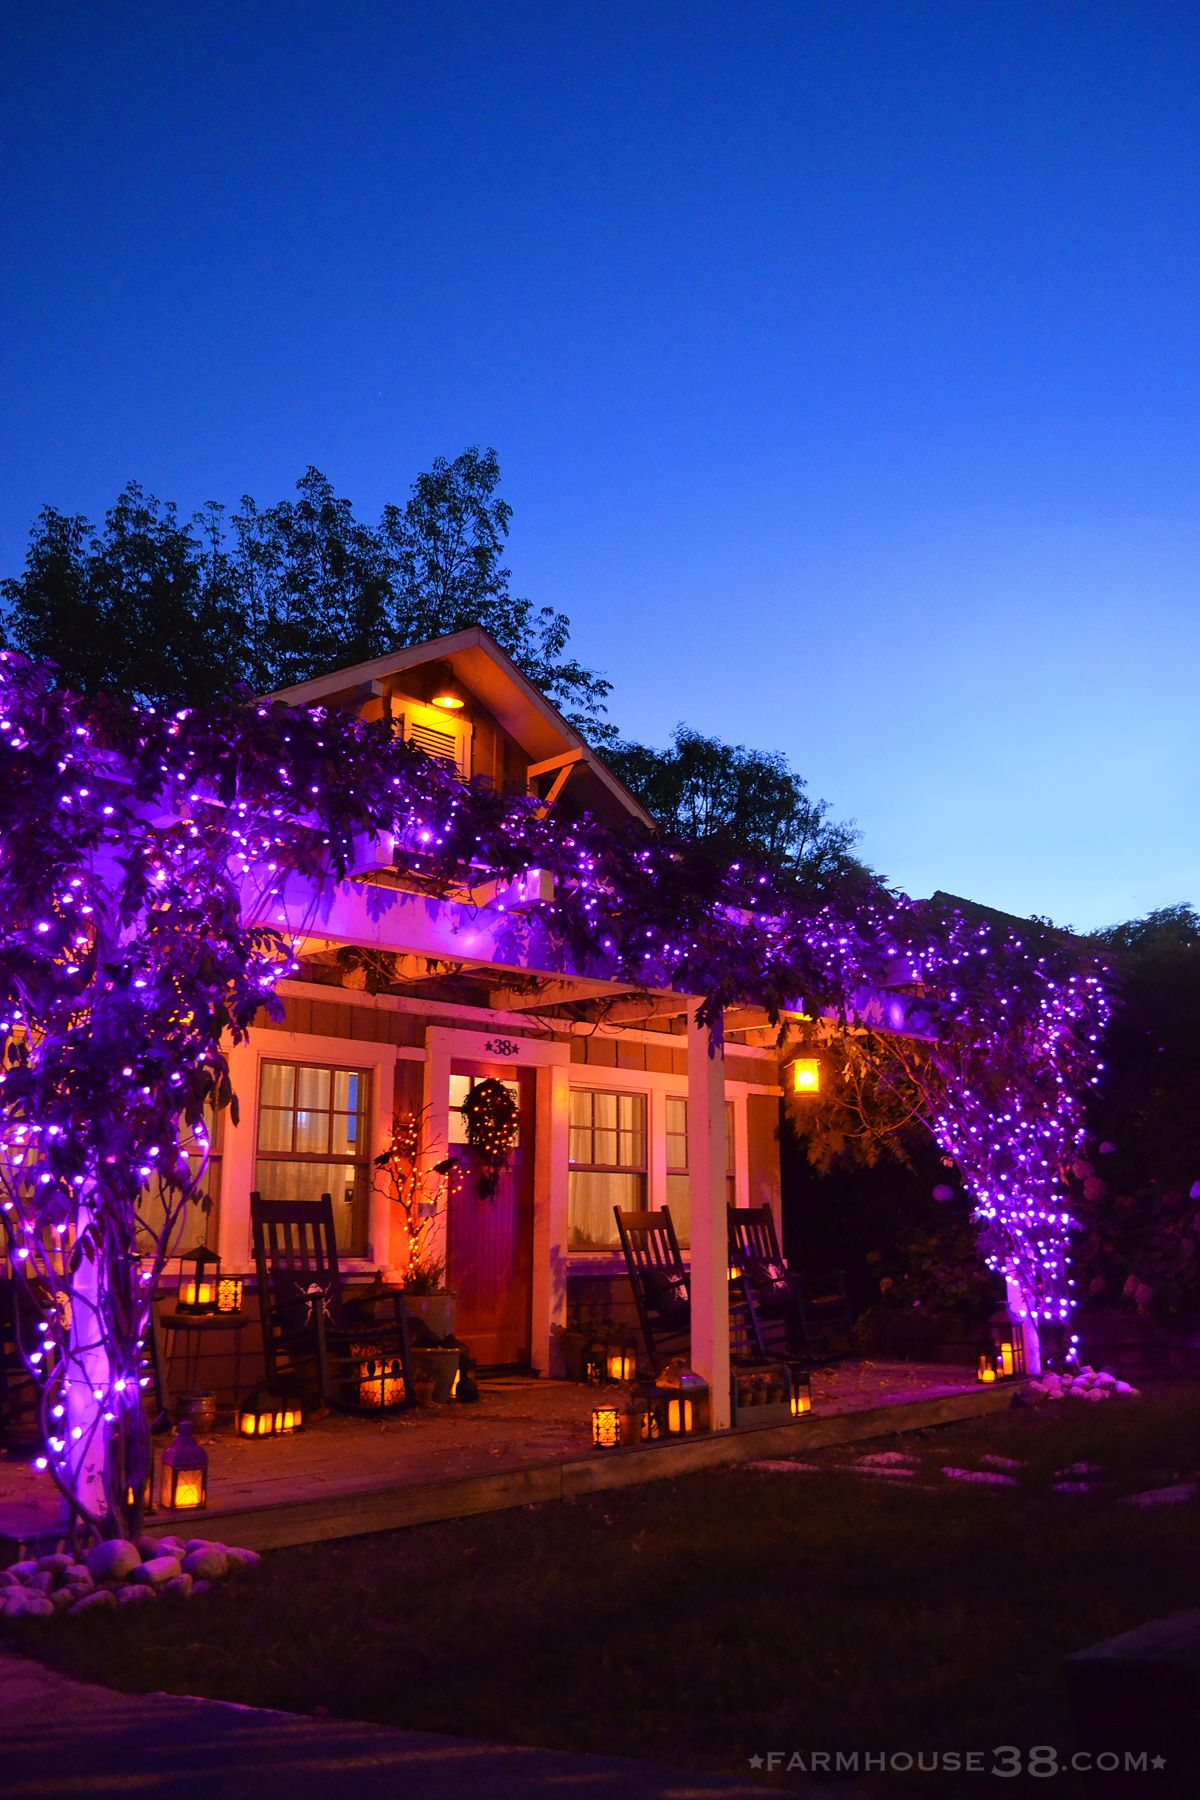 haunted house lighting ideas. Halloween Light Display At Farmhouse38.com Haunted House Lighting Ideas